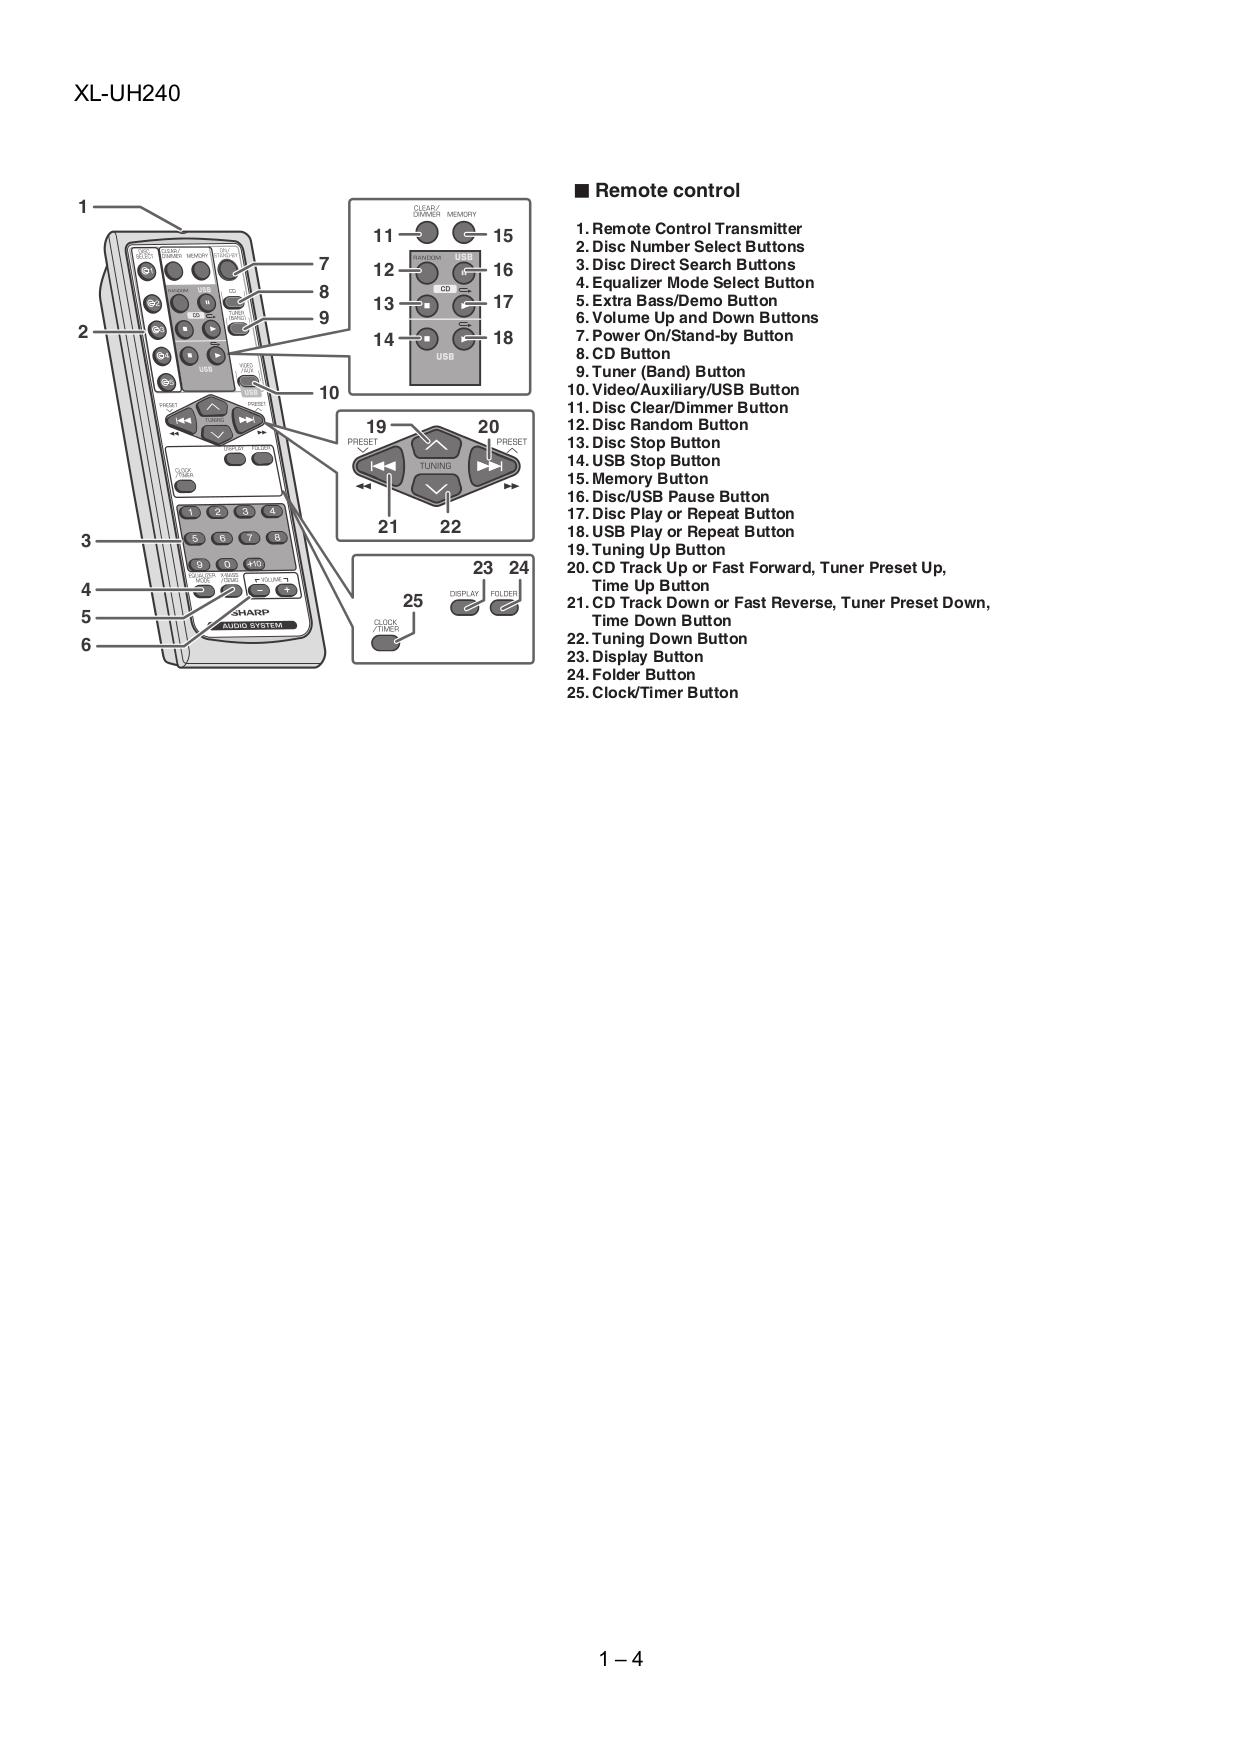 Sharp xl uh240 manual ebook sharp xl uh242 service manual array pdf manual for sharp other xl uh240 stereo systems rh umlib com fandeluxe Images